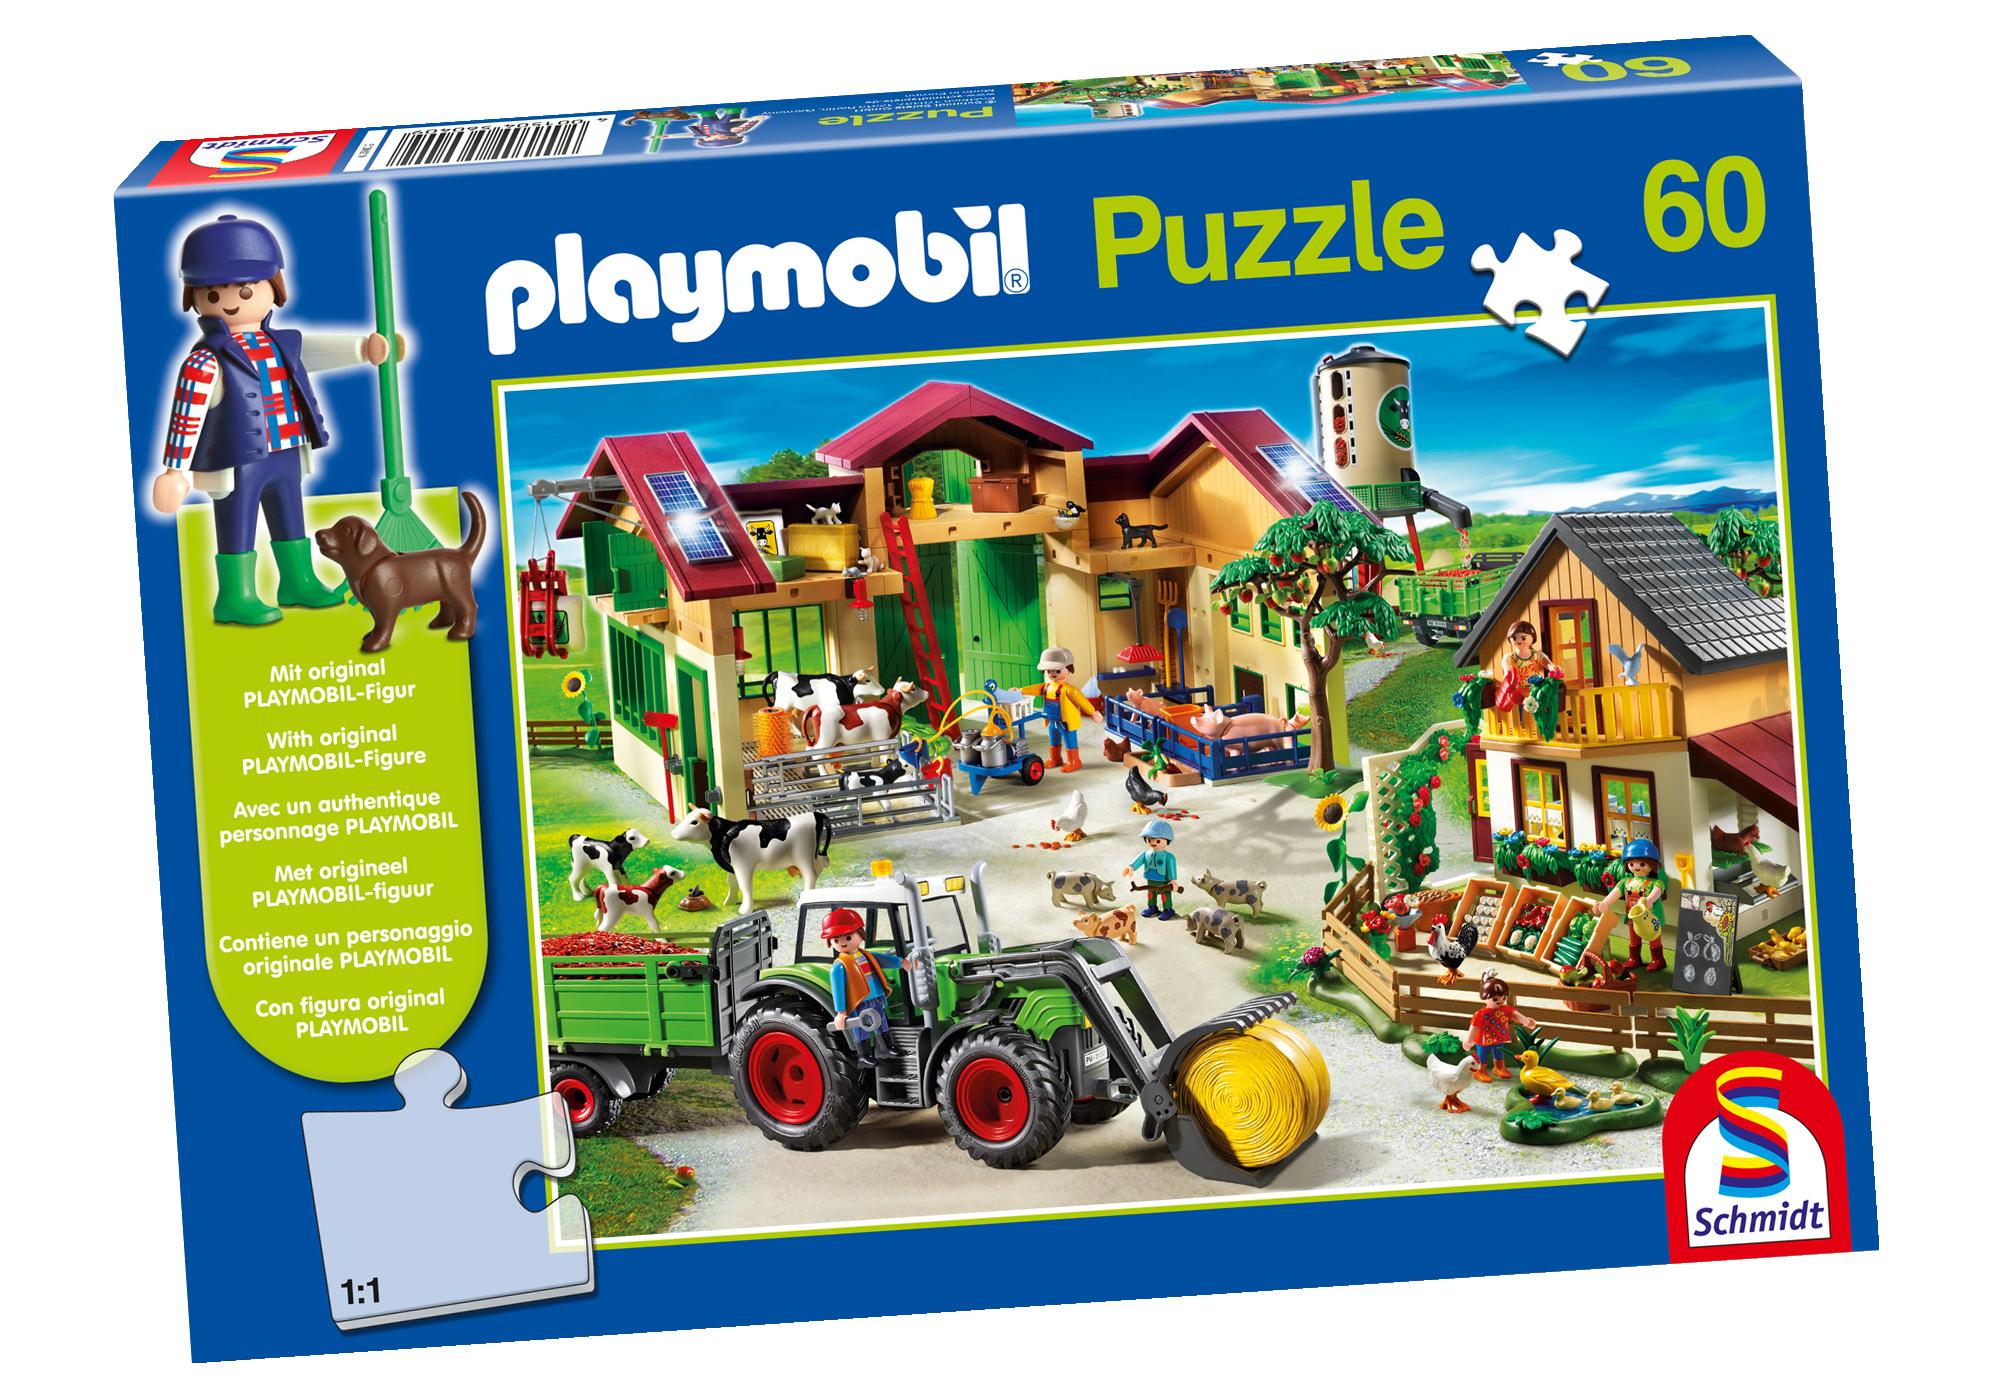 http://media.playmobil.com/i/playmobil/80352_product_detail/Puzzle - la ferme bio (60 pièces)